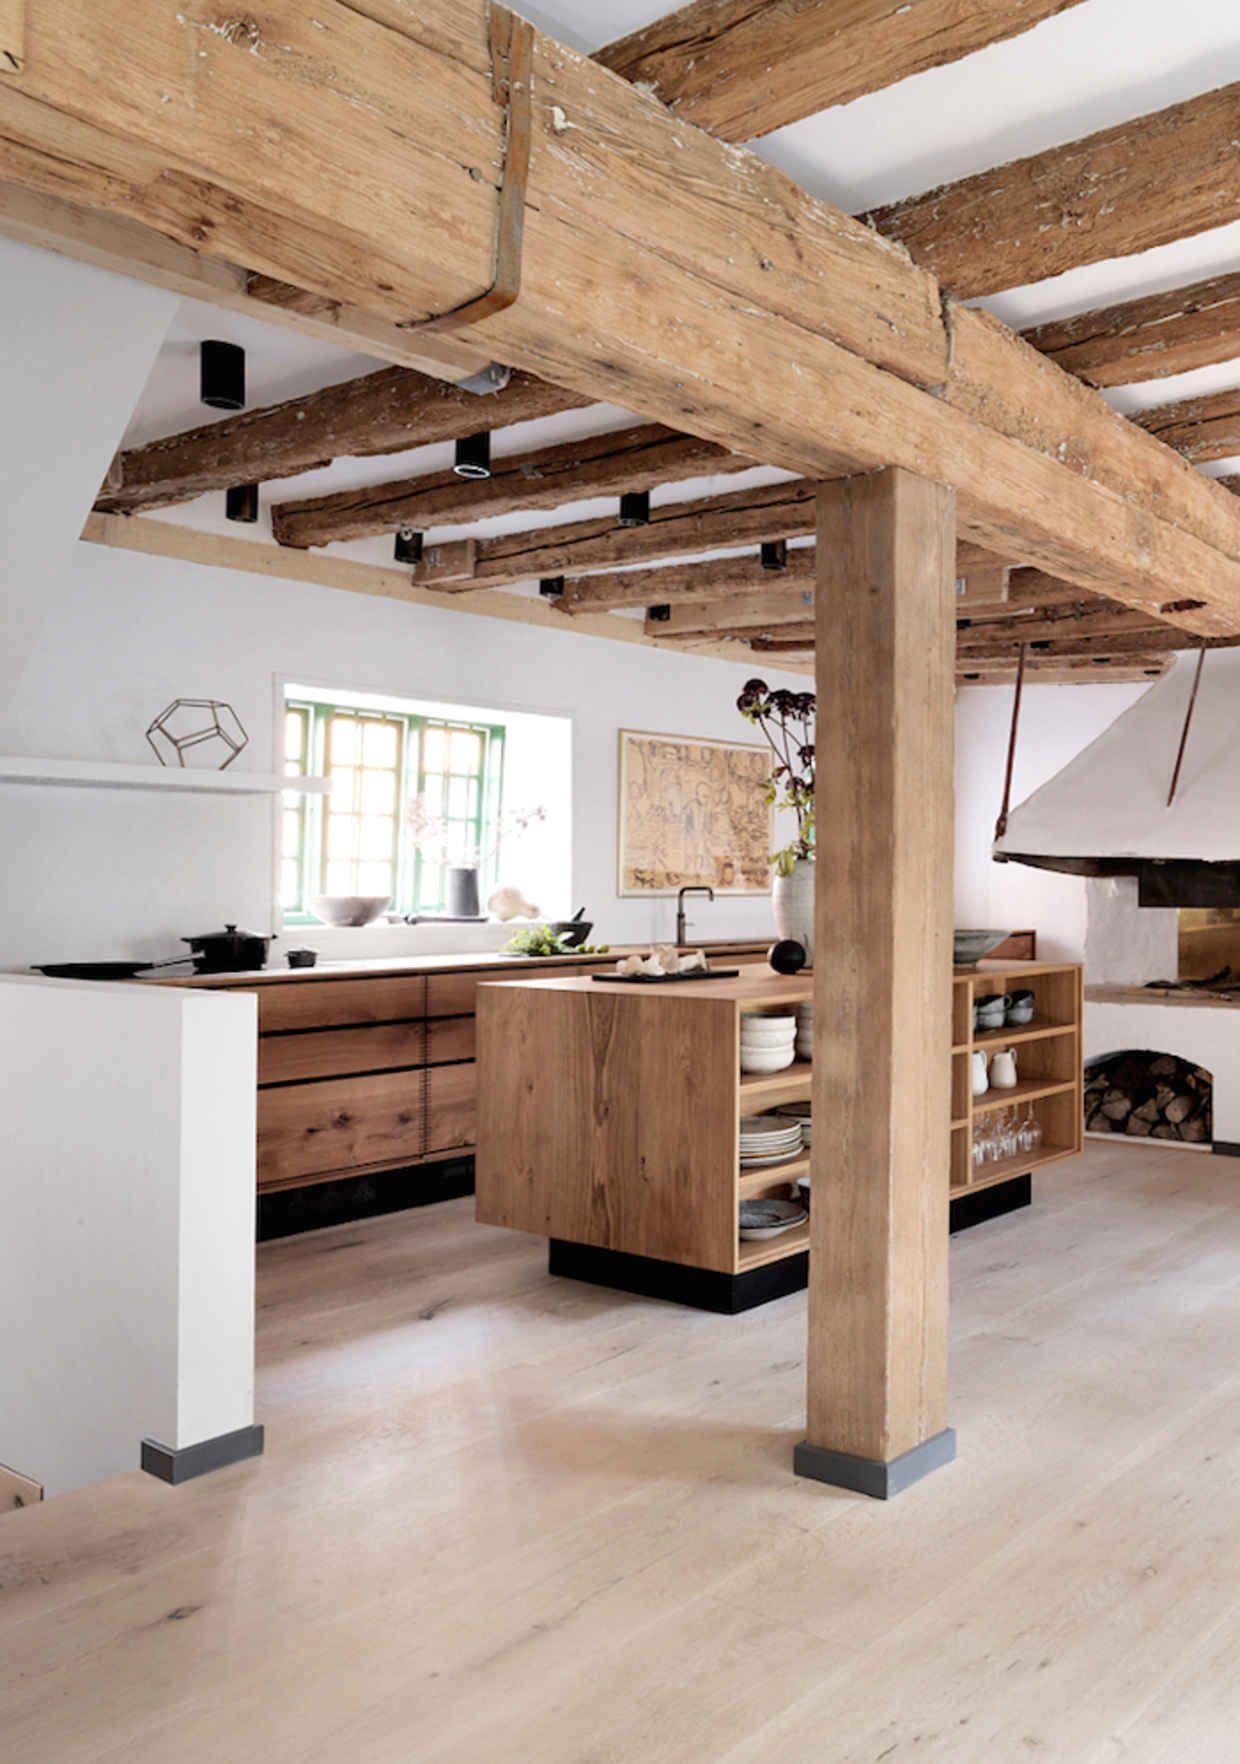 Inspiring Examples Of Minimal Interior Design 6 | Minimal, Interiors ...